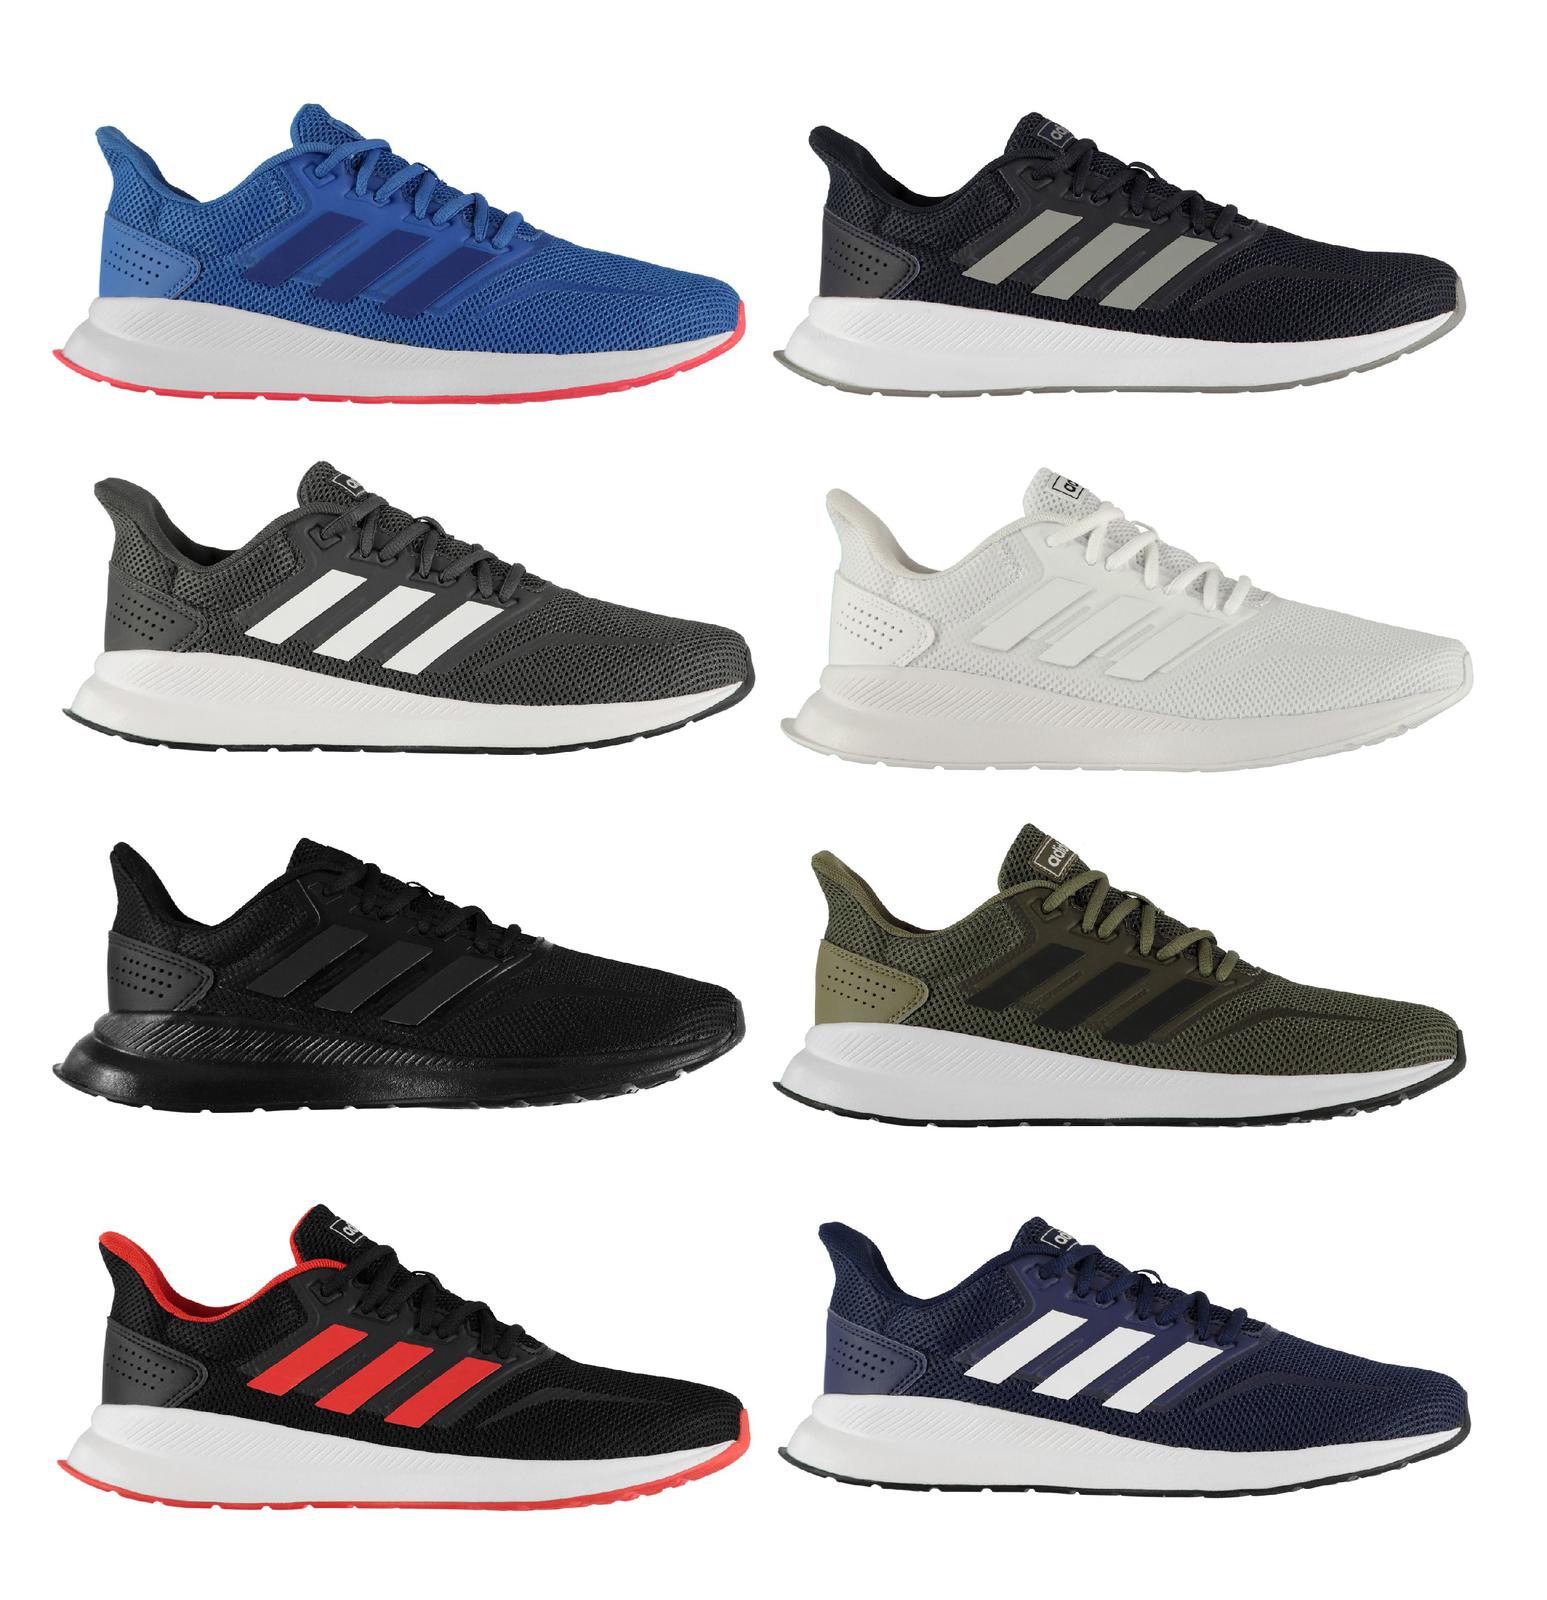 Adidas Falcon zapatillas de deporte caballero zapatillas calzado deportivo cortos 1375